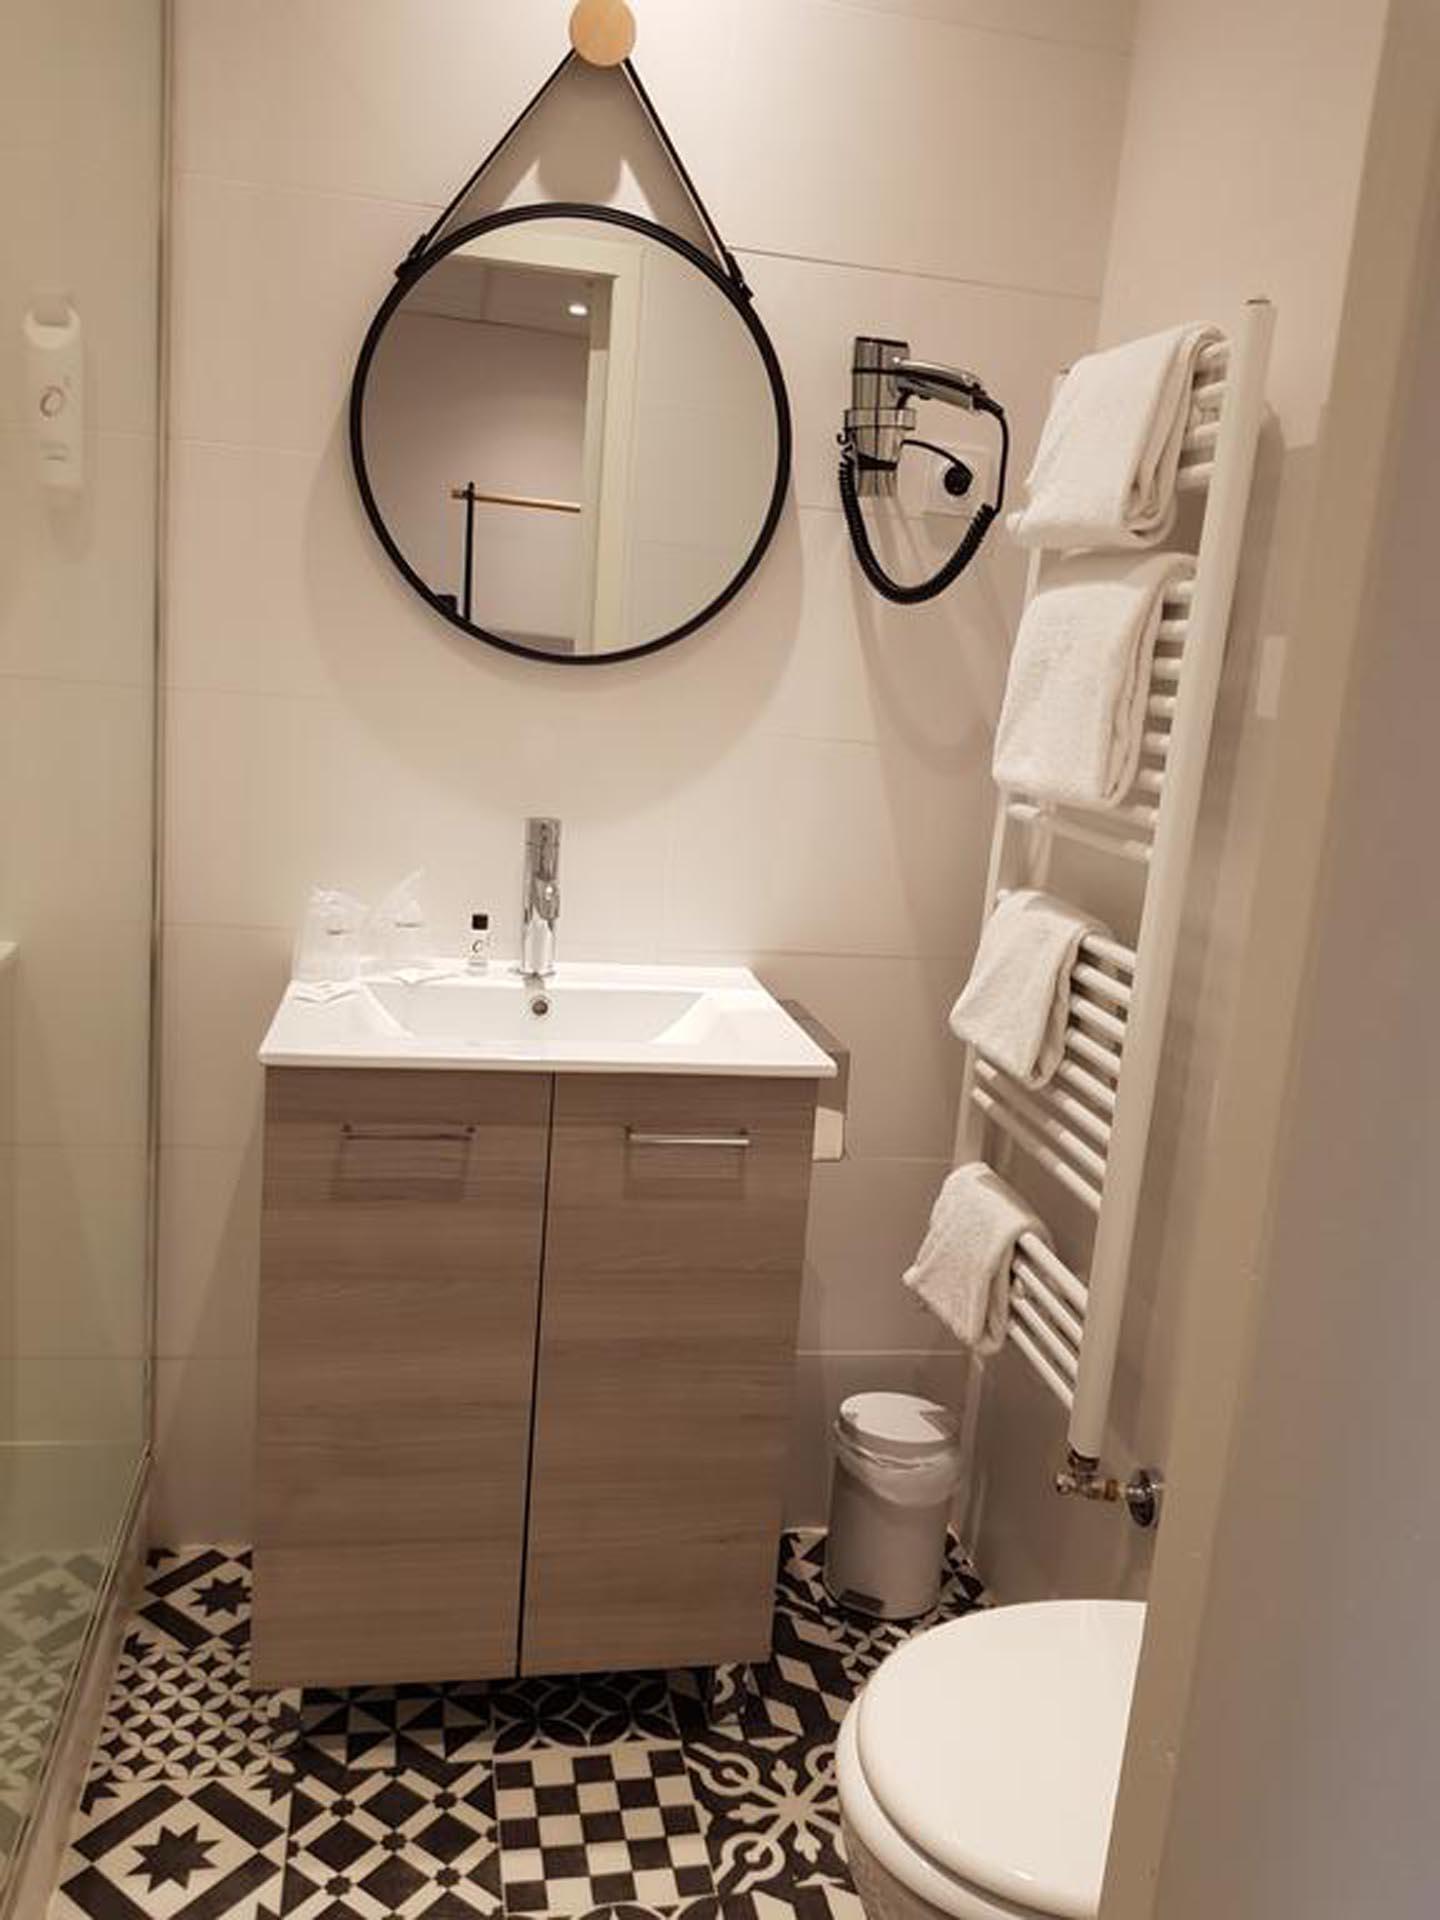 Bathroom at The Originals Boutique, Grand Hôtel Saint-Pierre